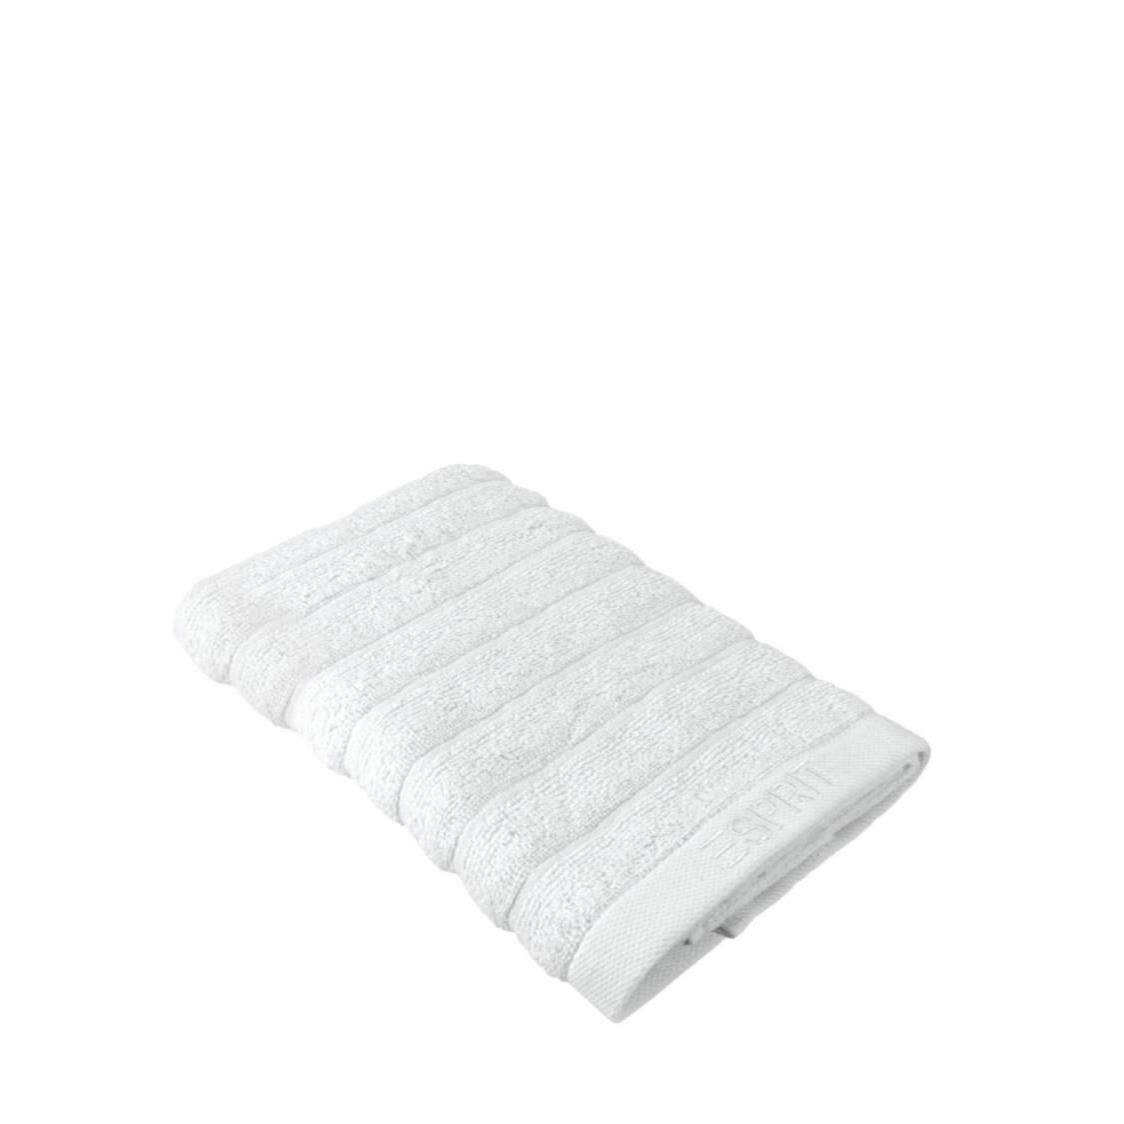 ESPRIT SEVILLE Hand Towel White